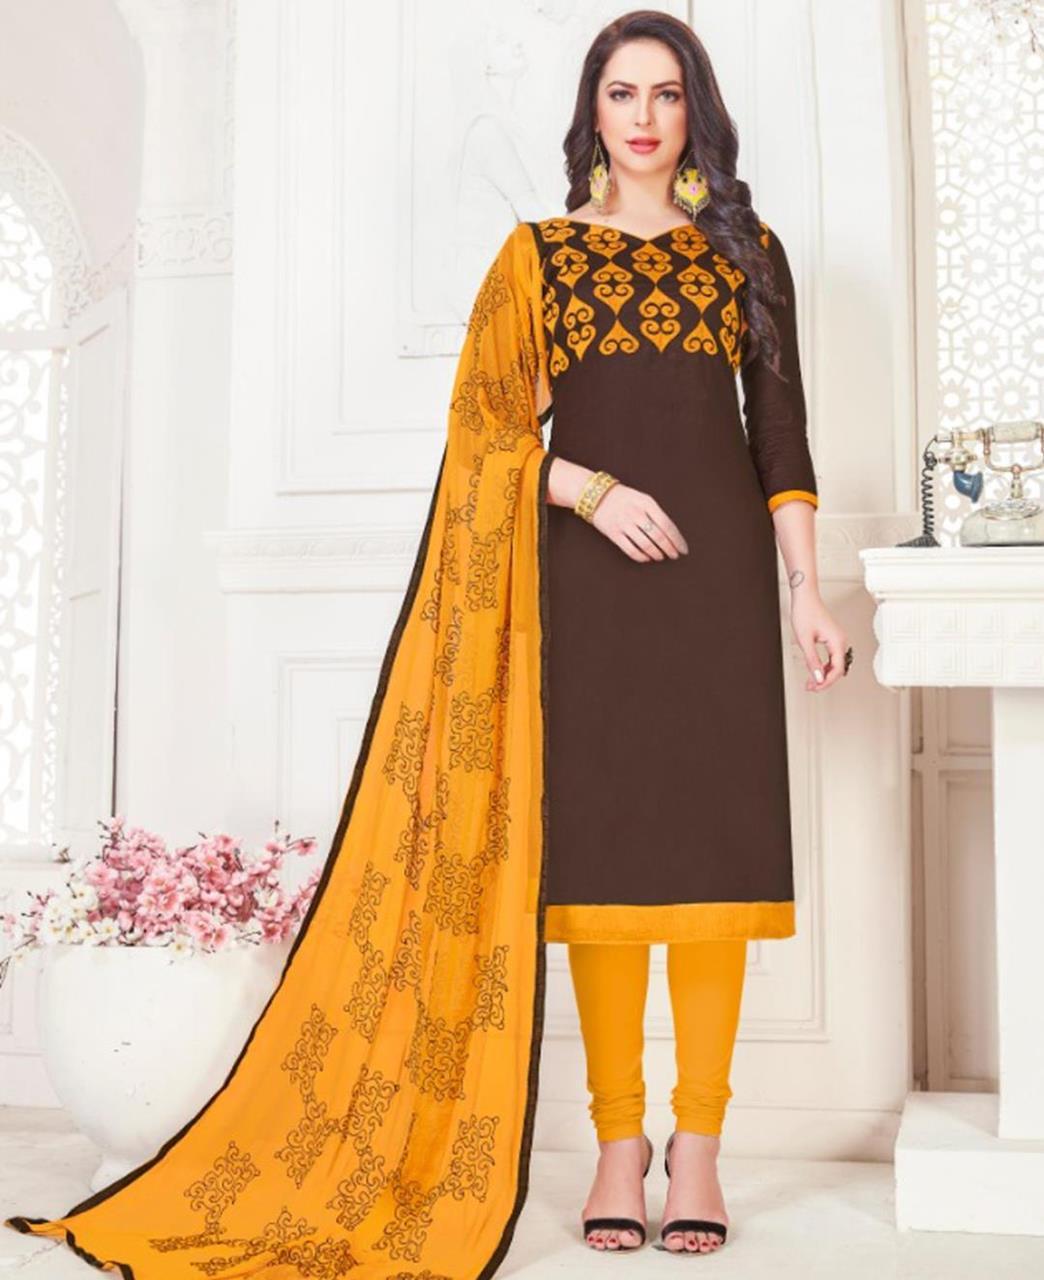 Embroidered Cotton Satin Brown Straight Cut Salwar Kameez